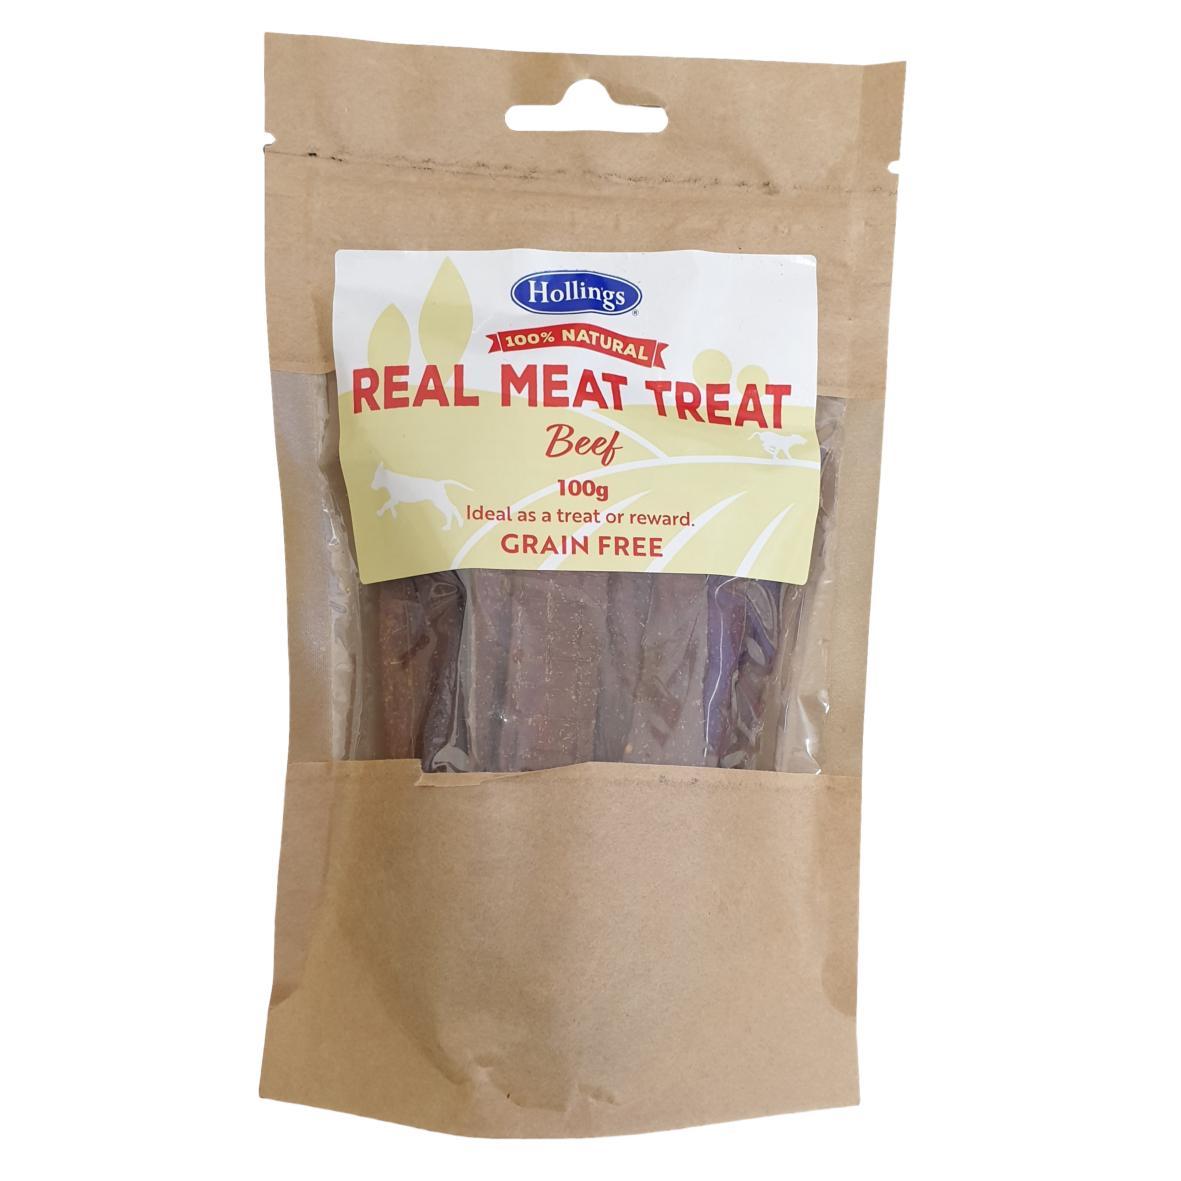 Hollings Real Meat Treat Beef 100gm